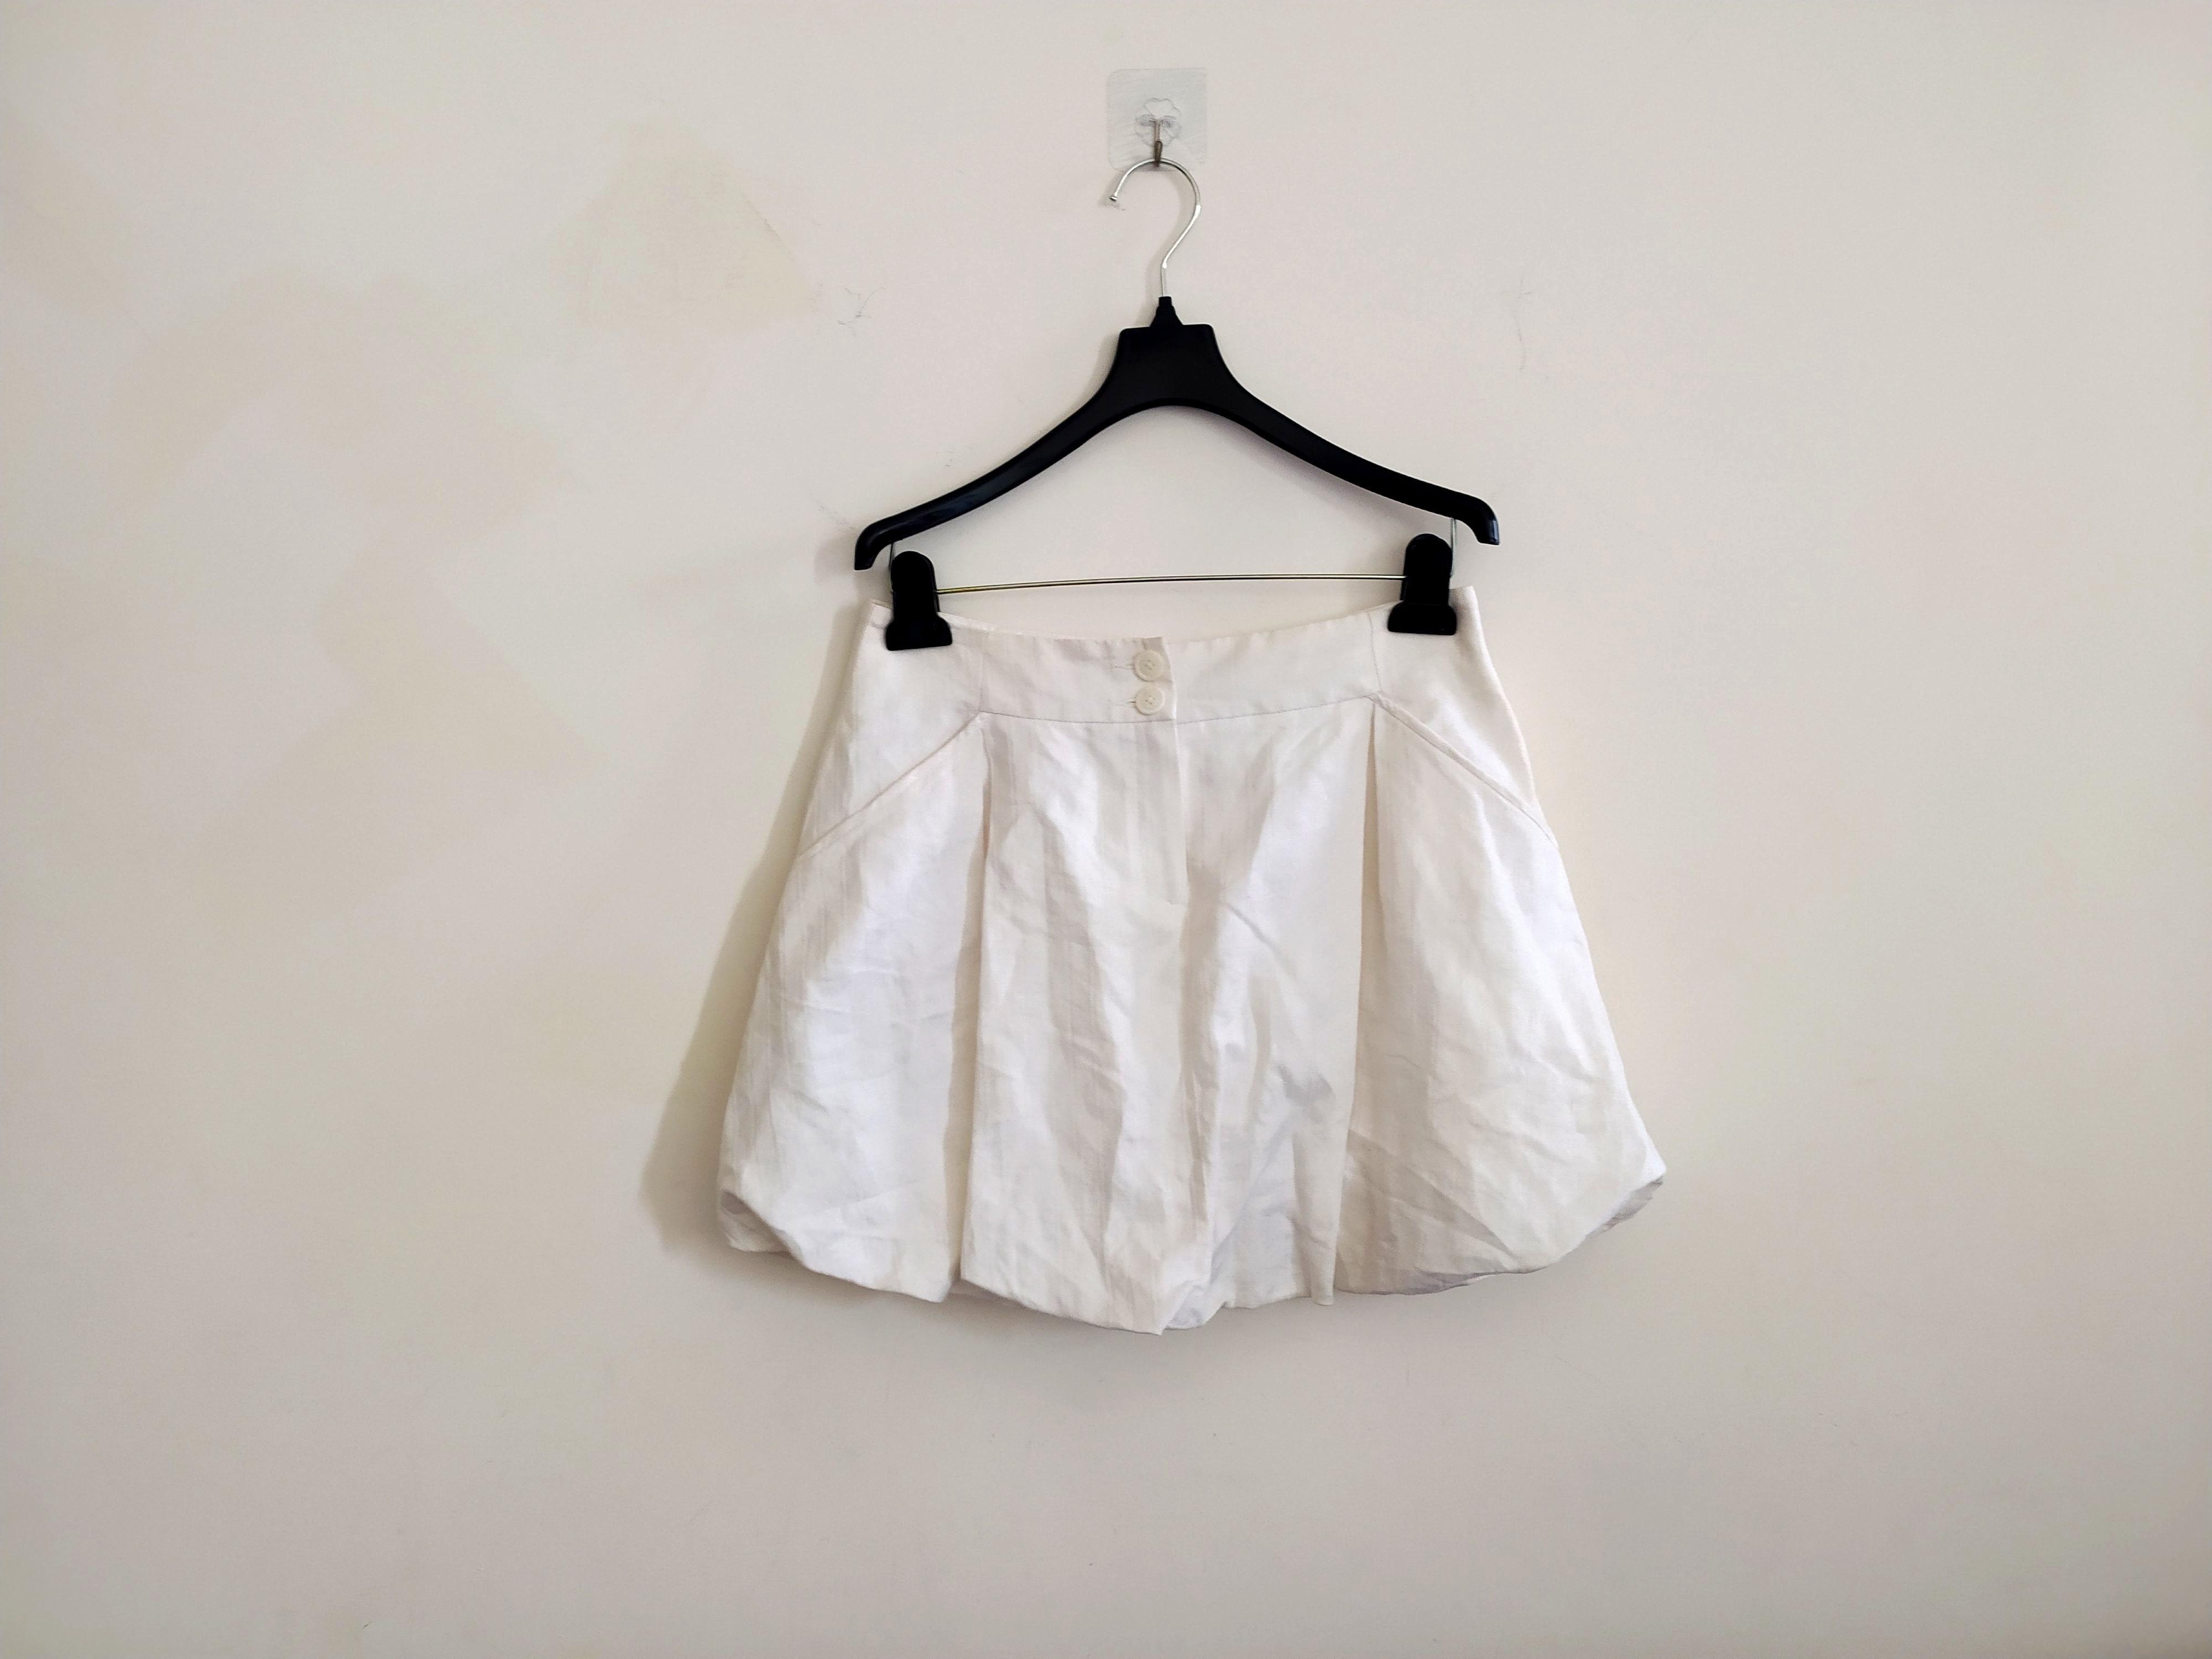 設計師La Feta俏麗短裙